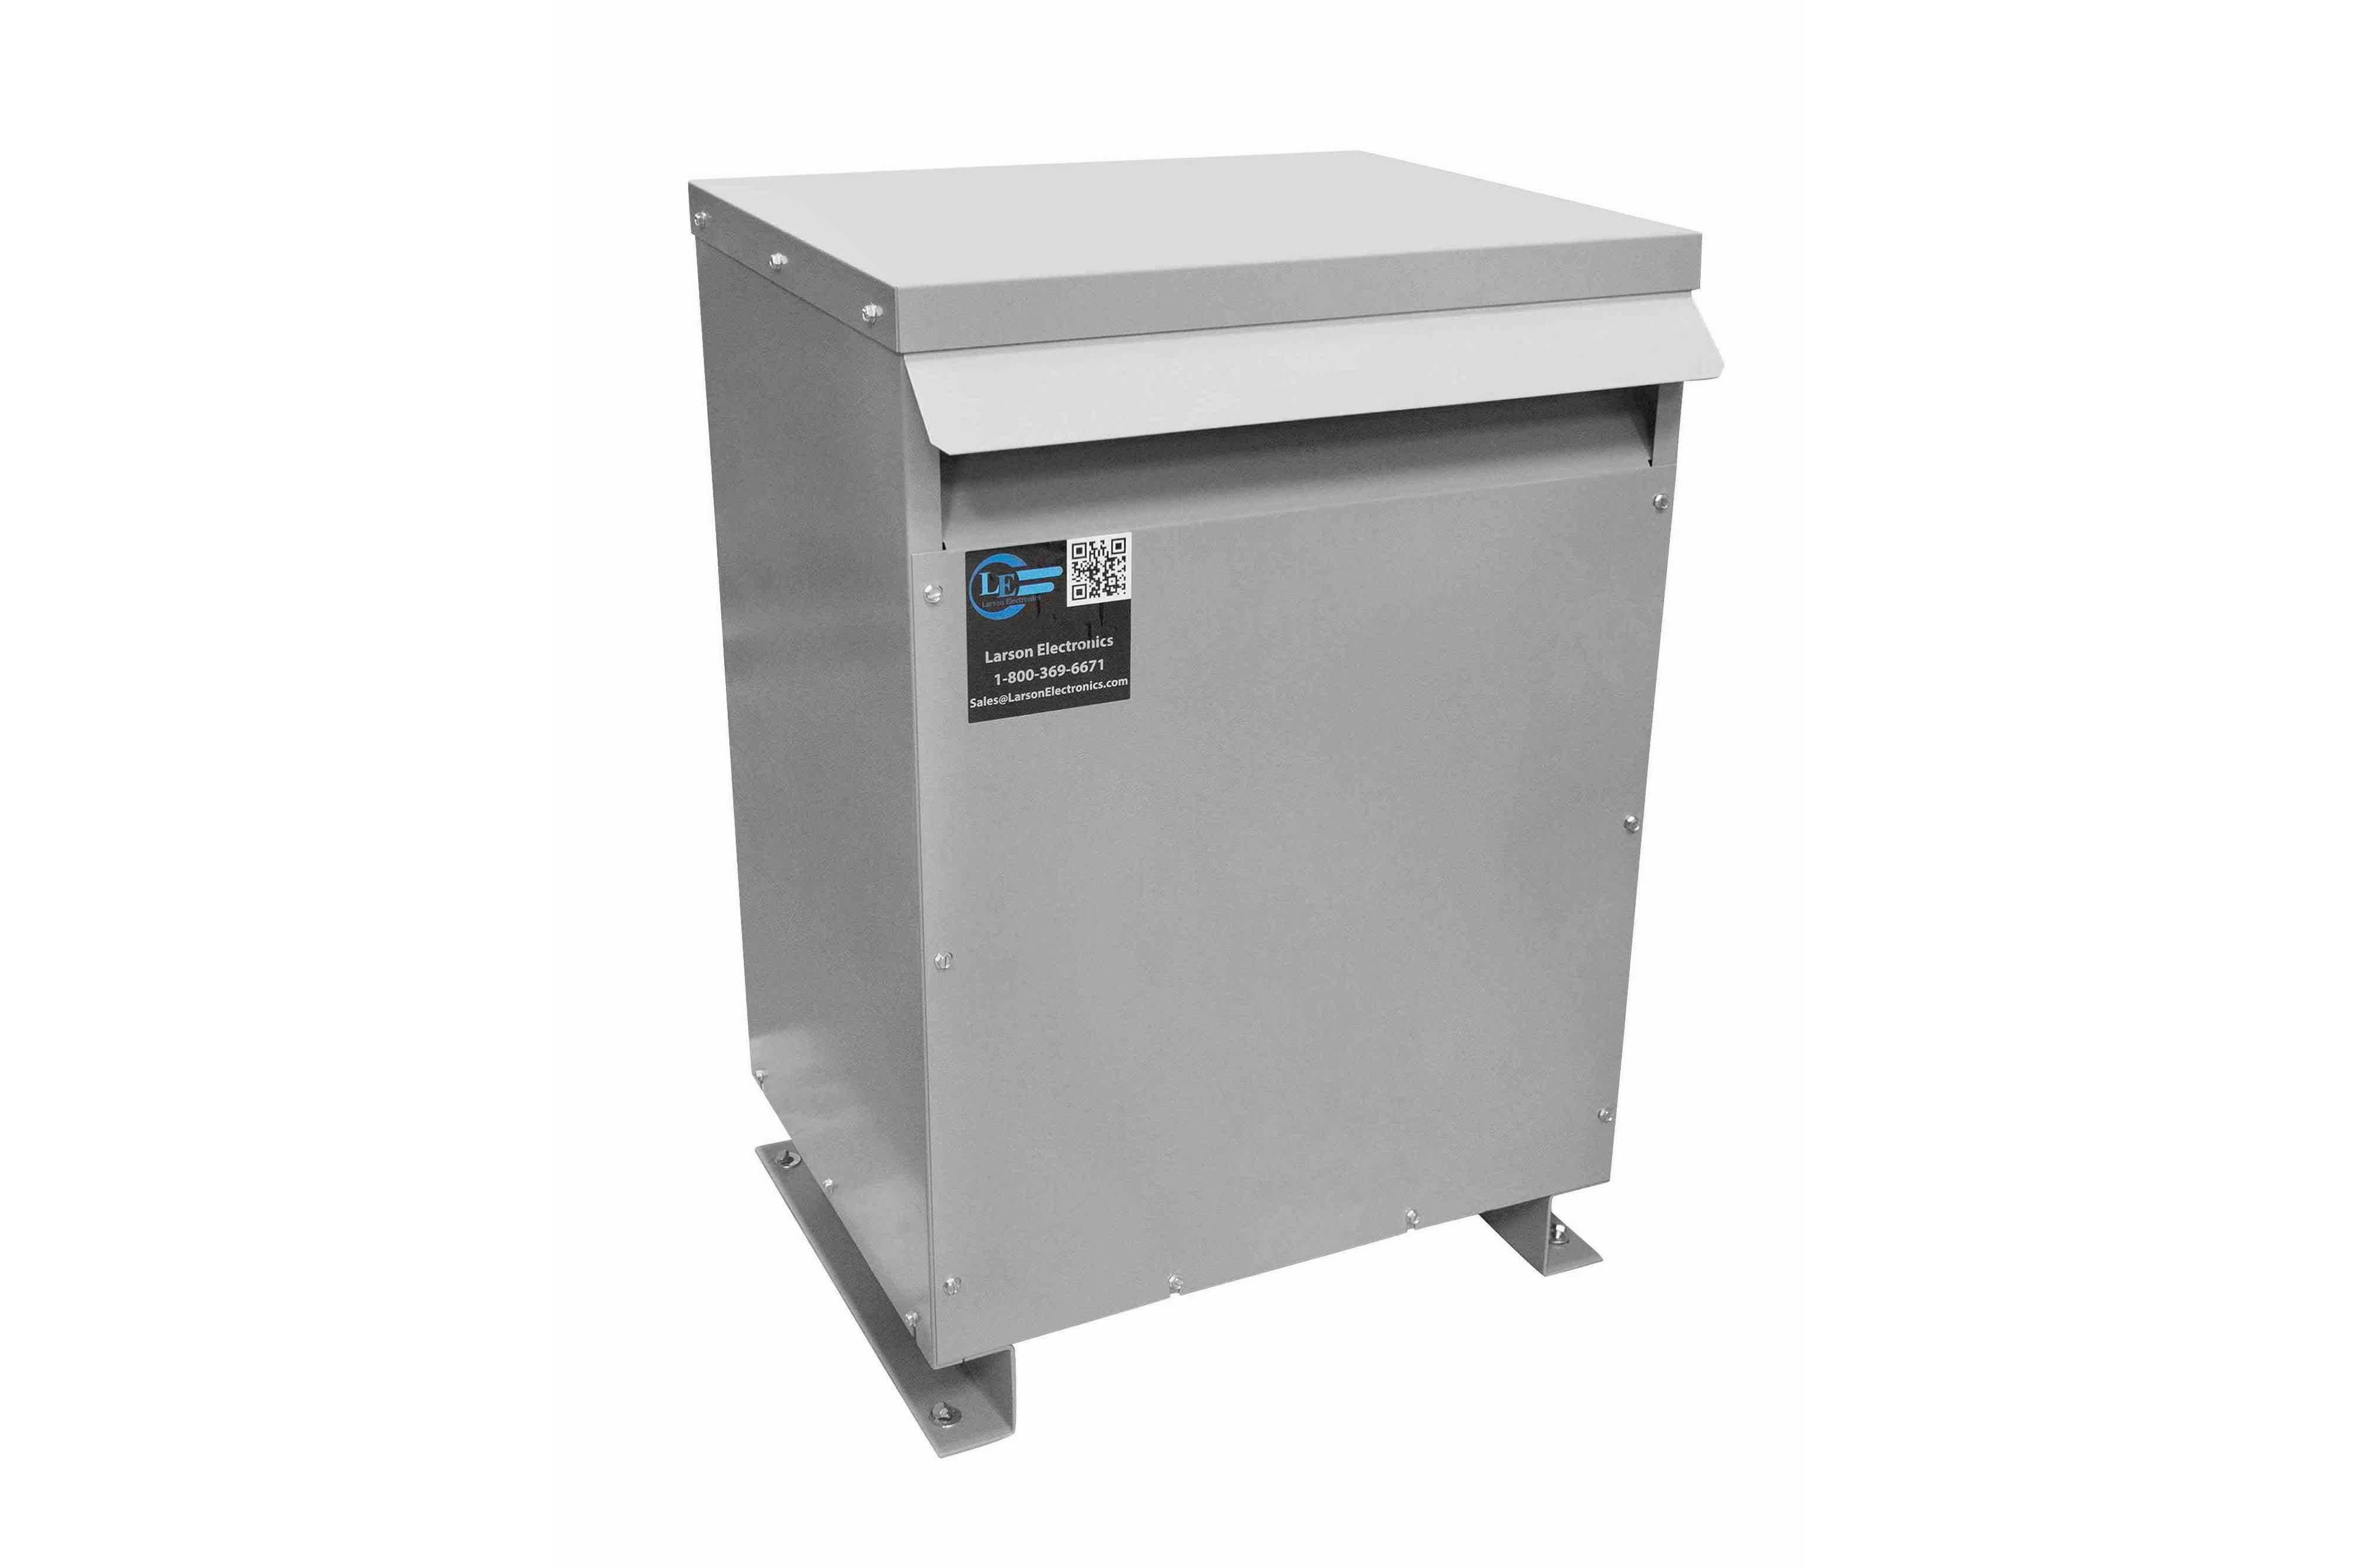 75 kVA 3PH Isolation Transformer, 240V Wye Primary, 208Y/120 Wye-N Secondary, N3R, Ventilated, 60 Hz